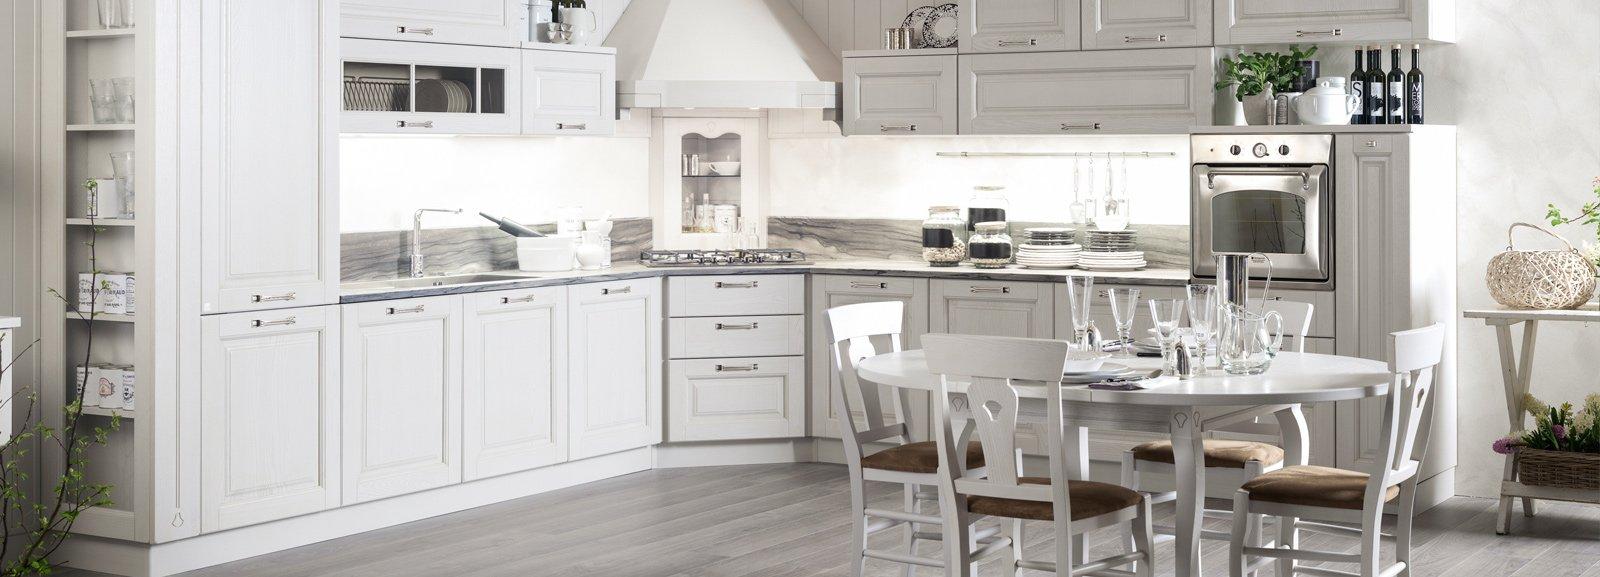 cucine moderne bianche classiche : La nuova cucina country ? new classic - Cose di Casa